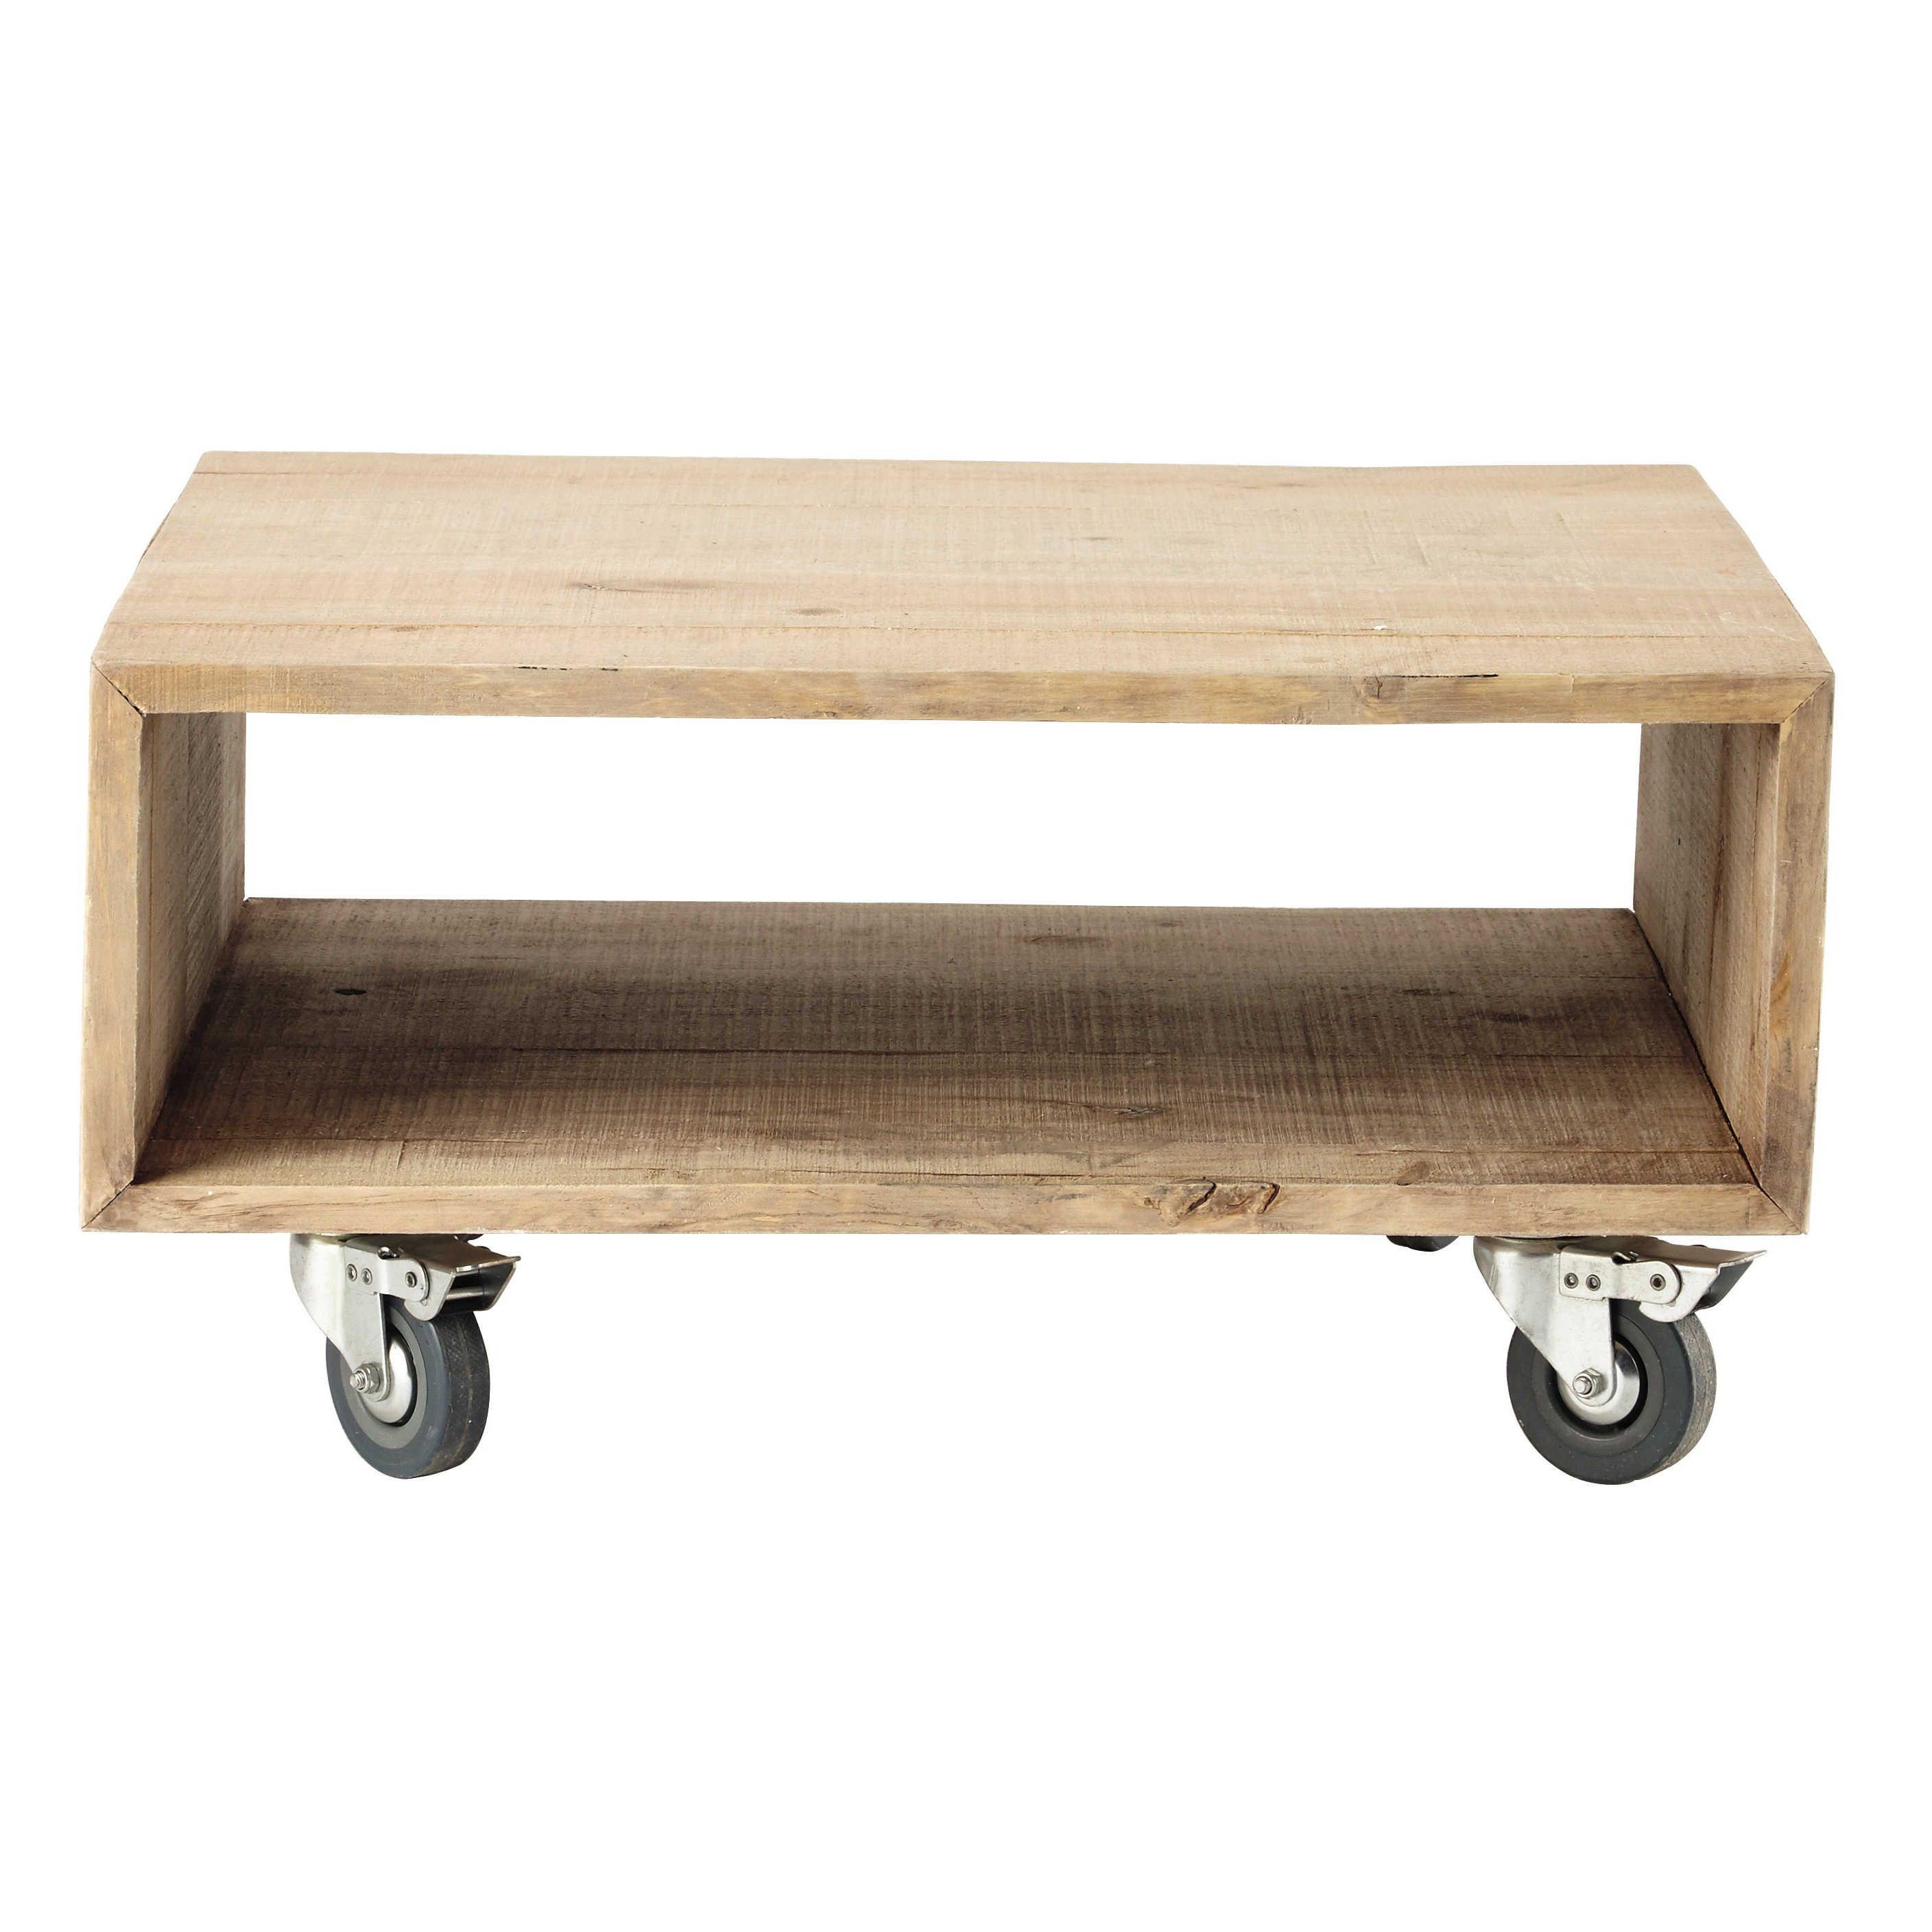 Bijzettafel Op Wieltjes.Accessoire Meubels Living Wooden Side Table Affordable